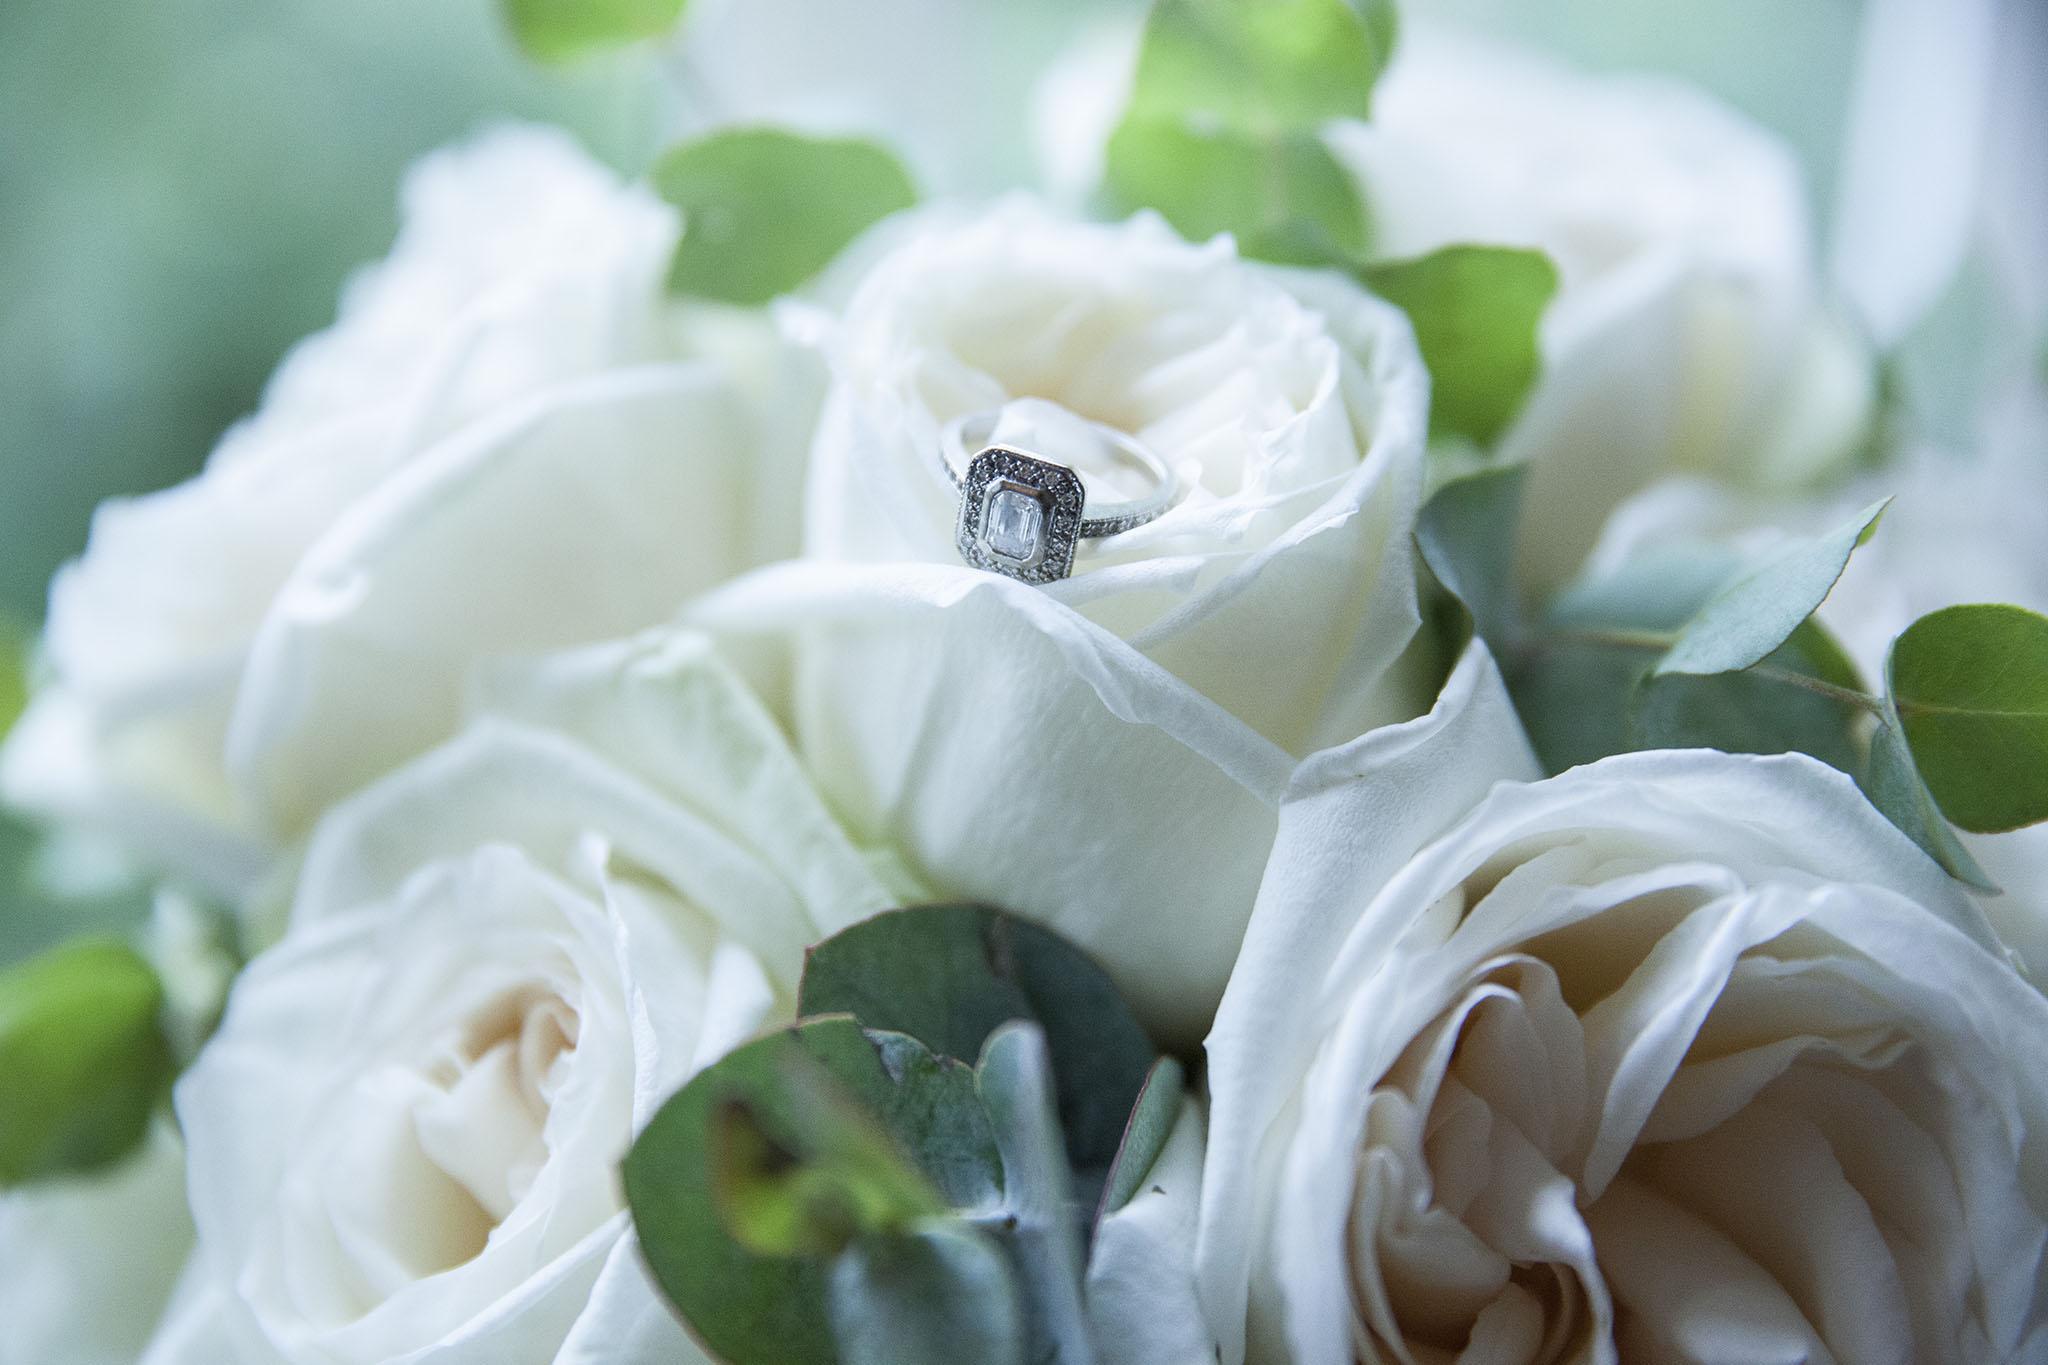 elizabethg_photography_hertfordshire_fineart_photographer_tonycharlie_wedding_photography_aldermaston_wasing_park_reading_07.jpg